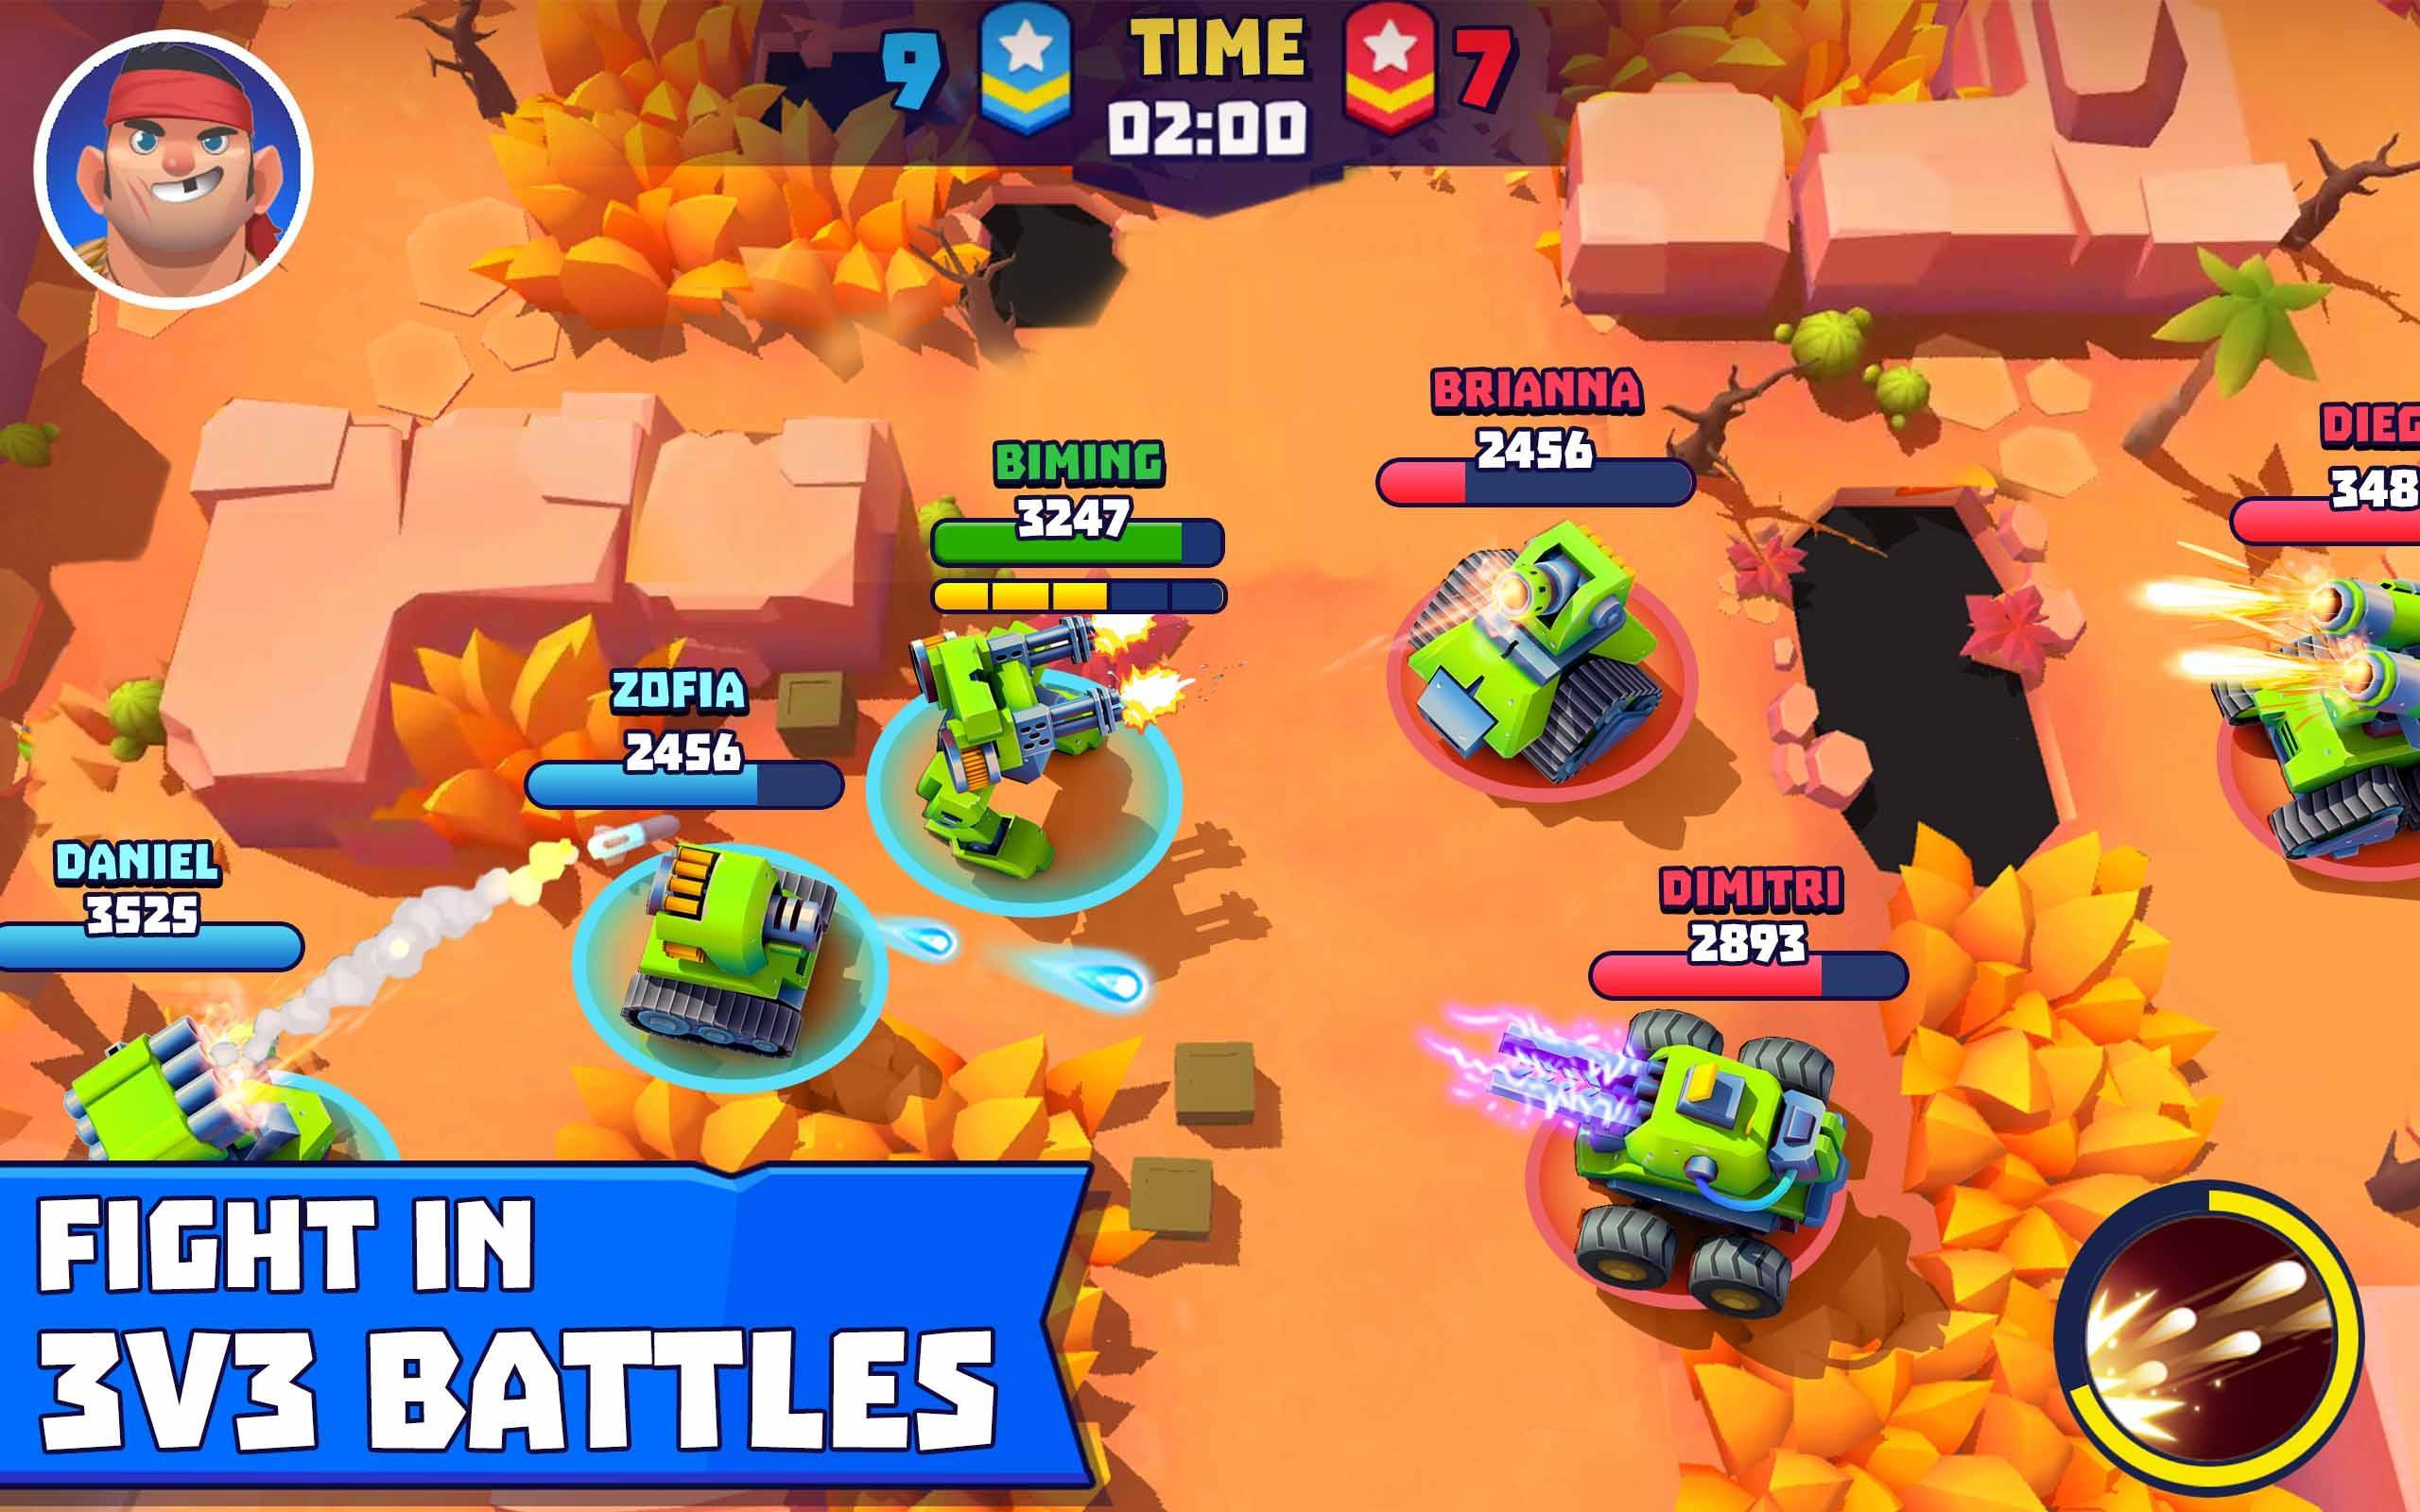 Tanks A Lot! - Realtime Multiplayer Battle Arena 2.56 Screenshot 9